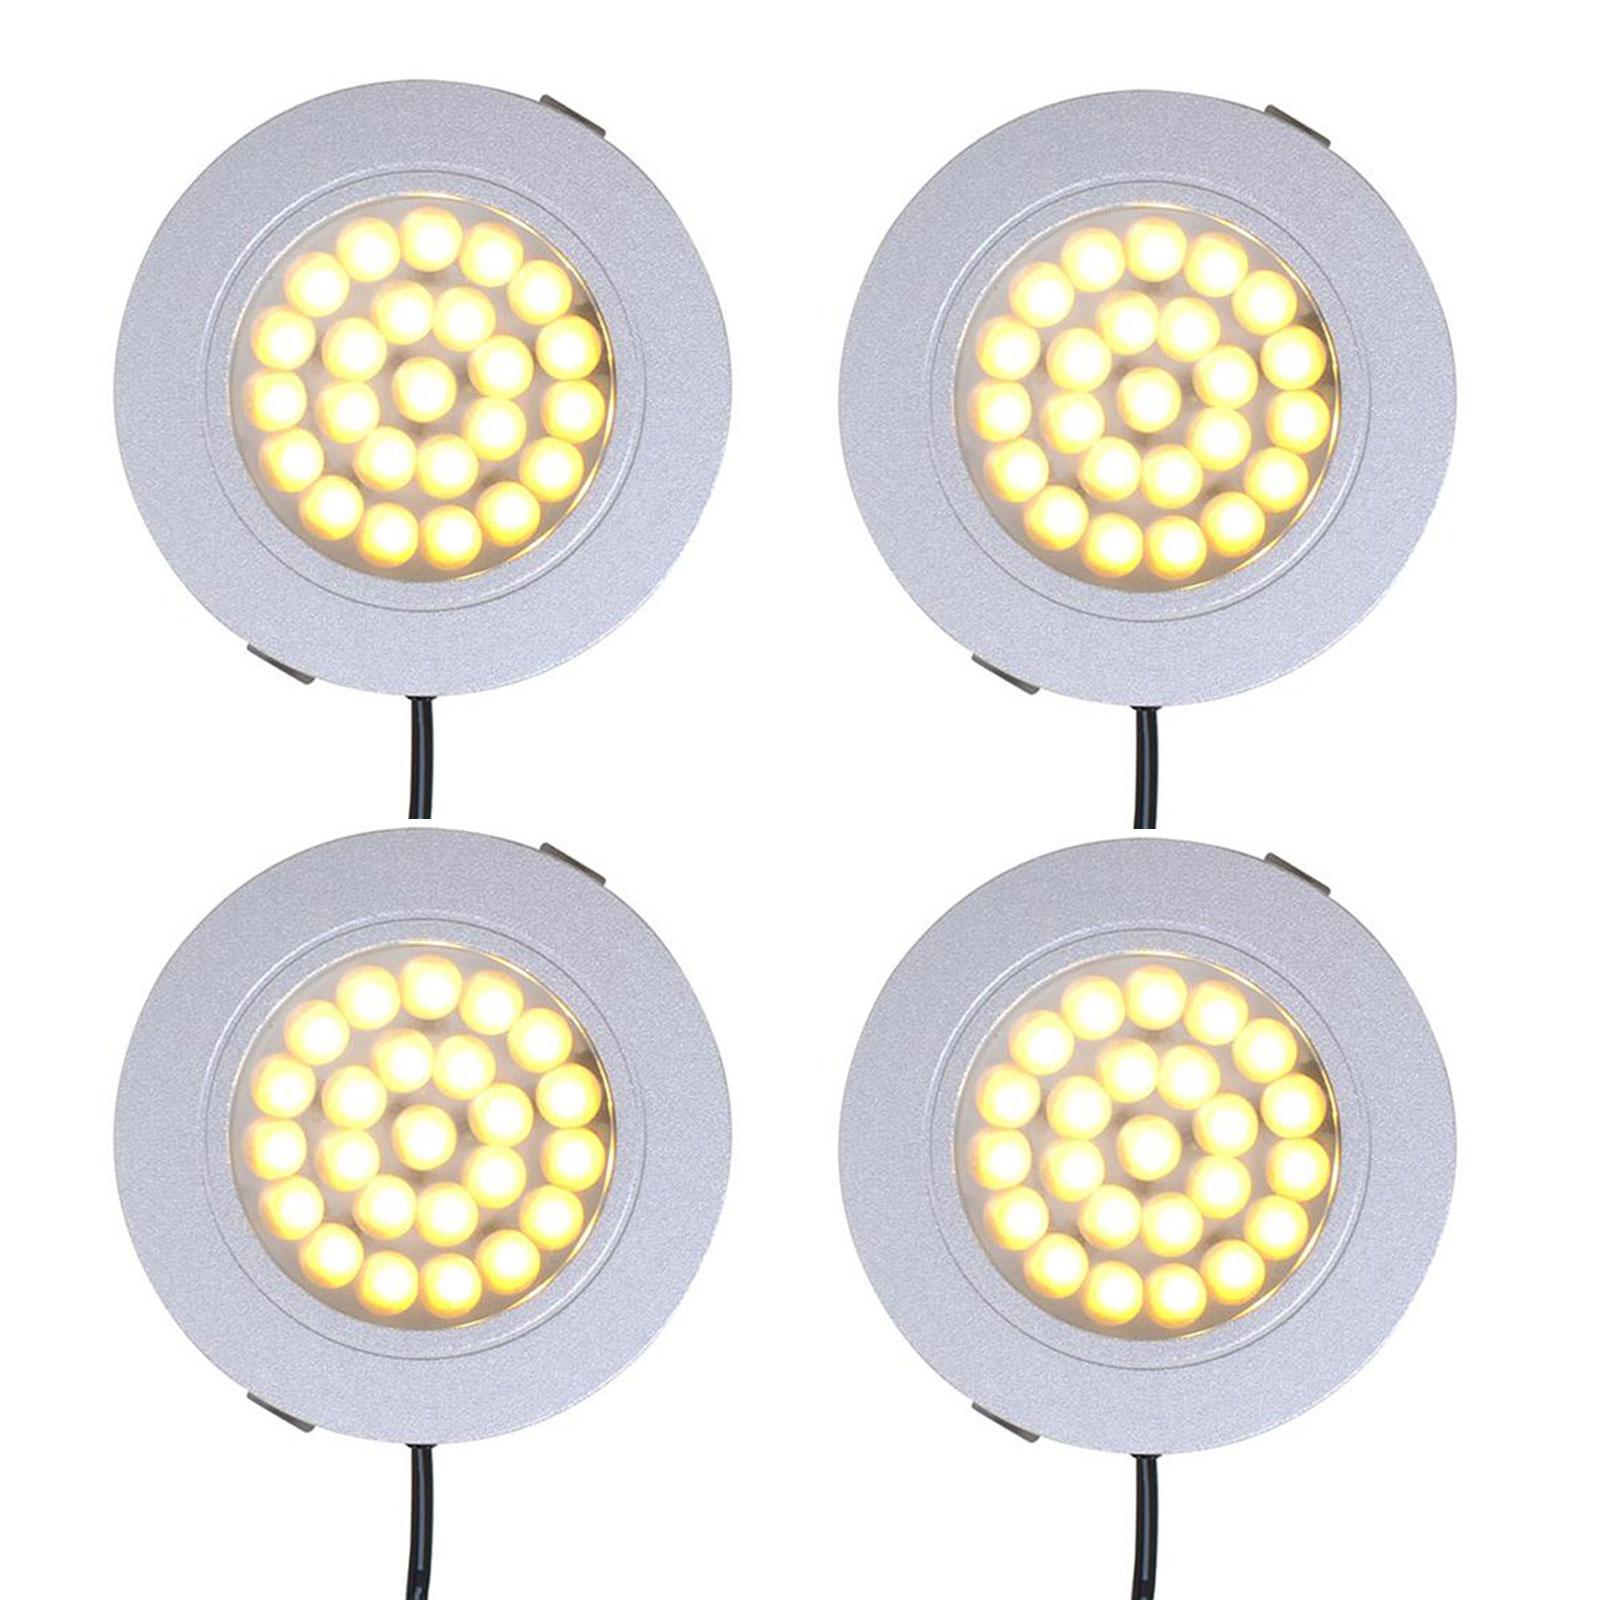 4er Set Einbauspot 24 LED-Deckenleuchte 12v, 220lm, Ø65x11mm